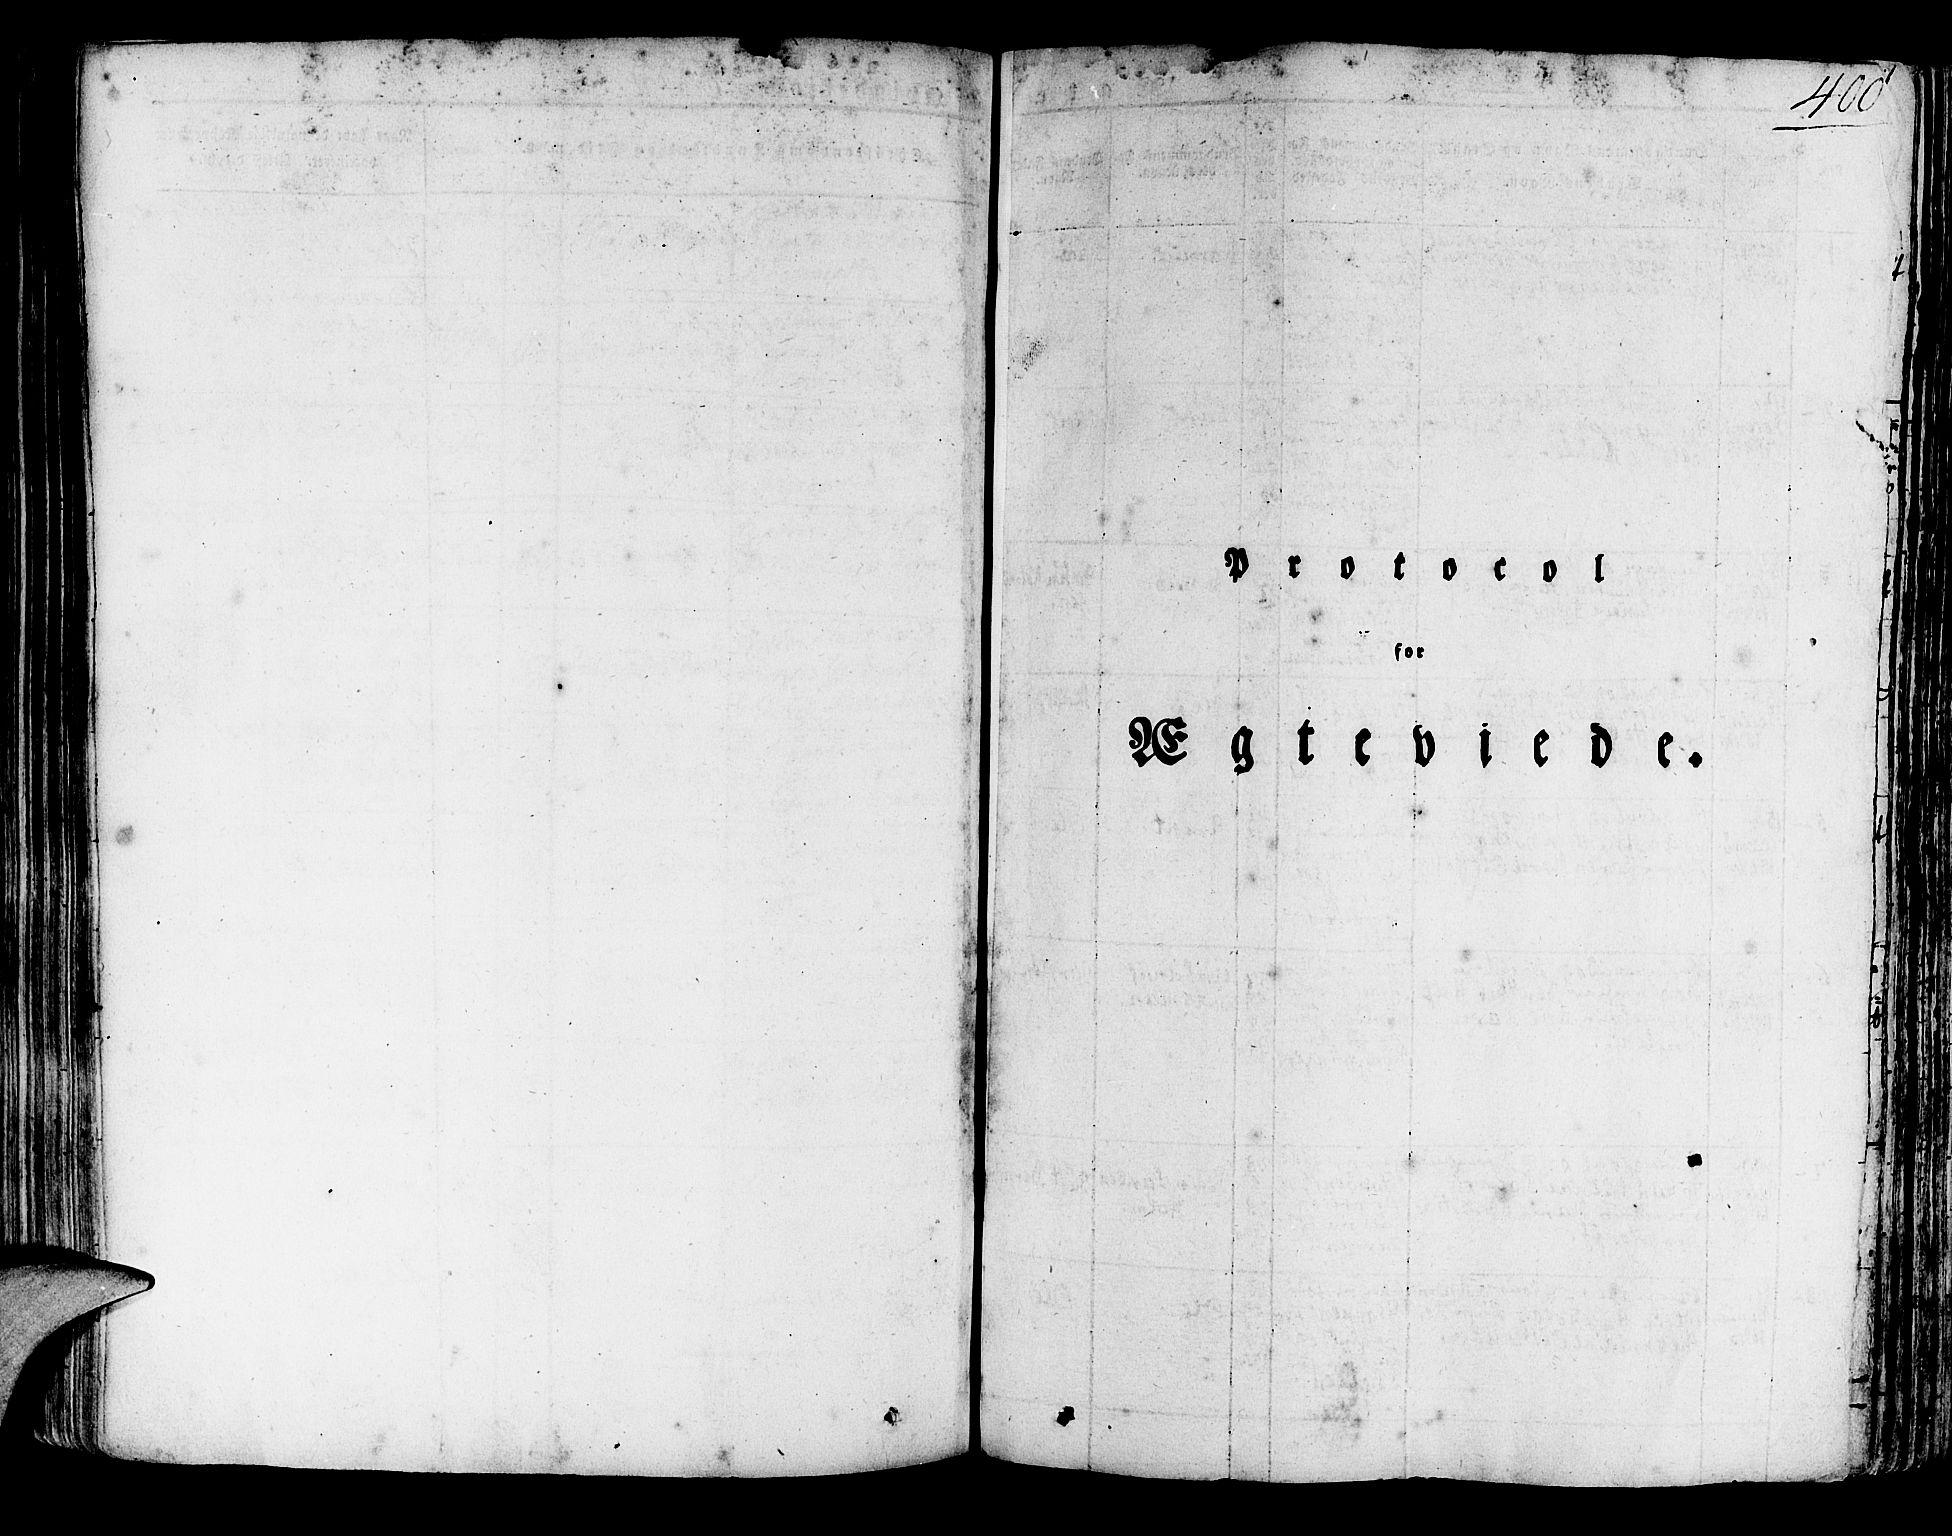 SAB, Korskirken Sokneprestembete, H/Haa/L0014: Ministerialbok nr. A 14, 1823-1835, s. 400